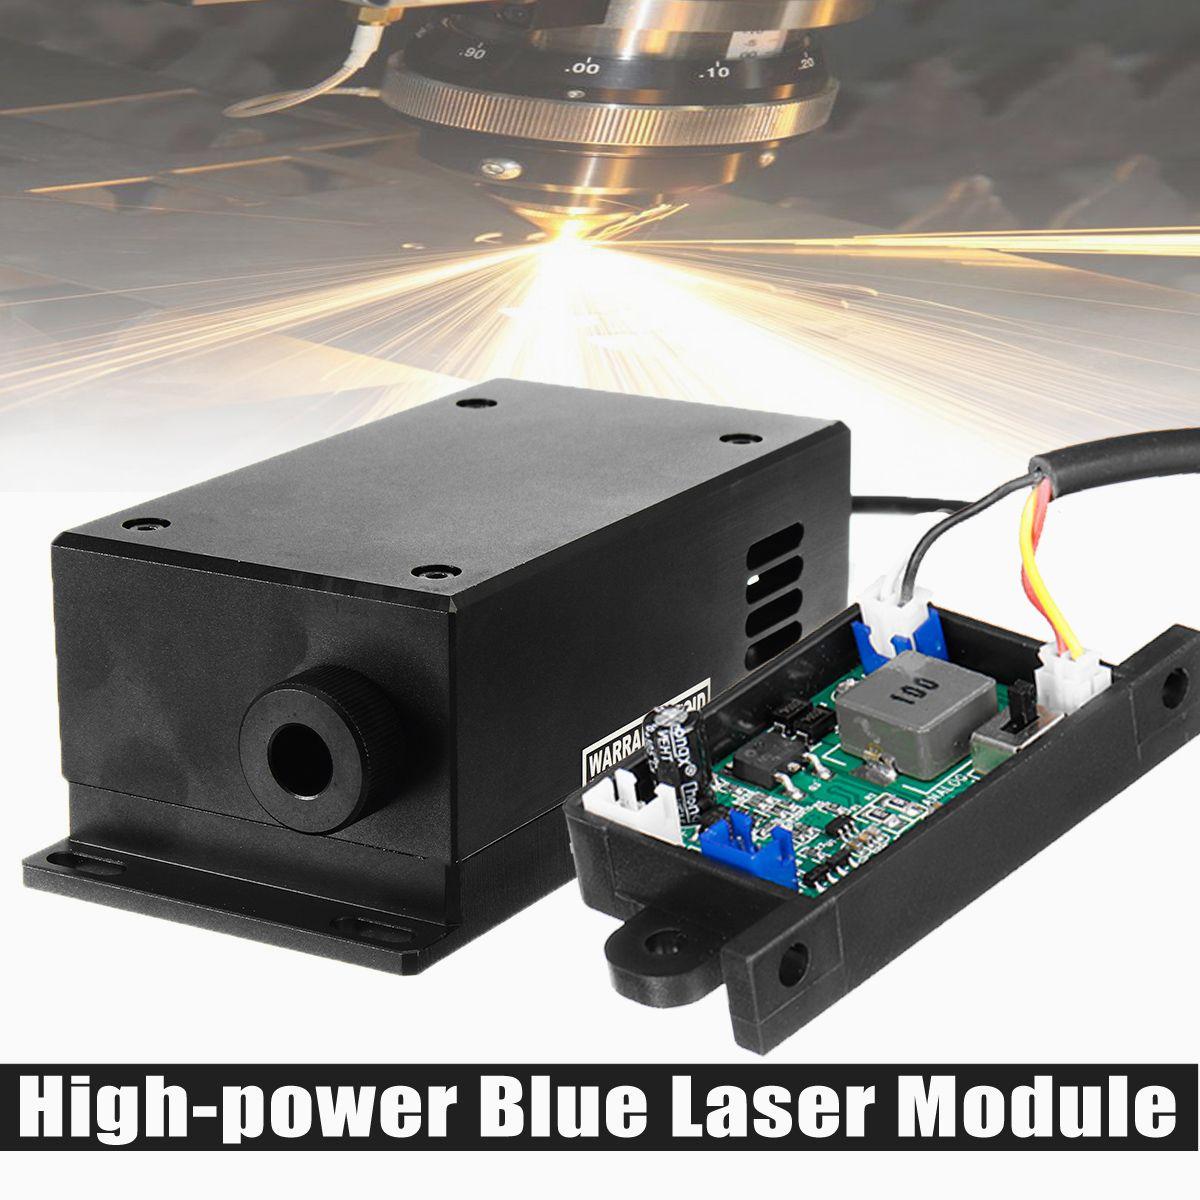 17 W High Power Laser Kopf Gravur Modul Einstellbare Brenn 450/445nm 17000 mw Blau Laser Modul DIY Holz metall Gravur Maschine